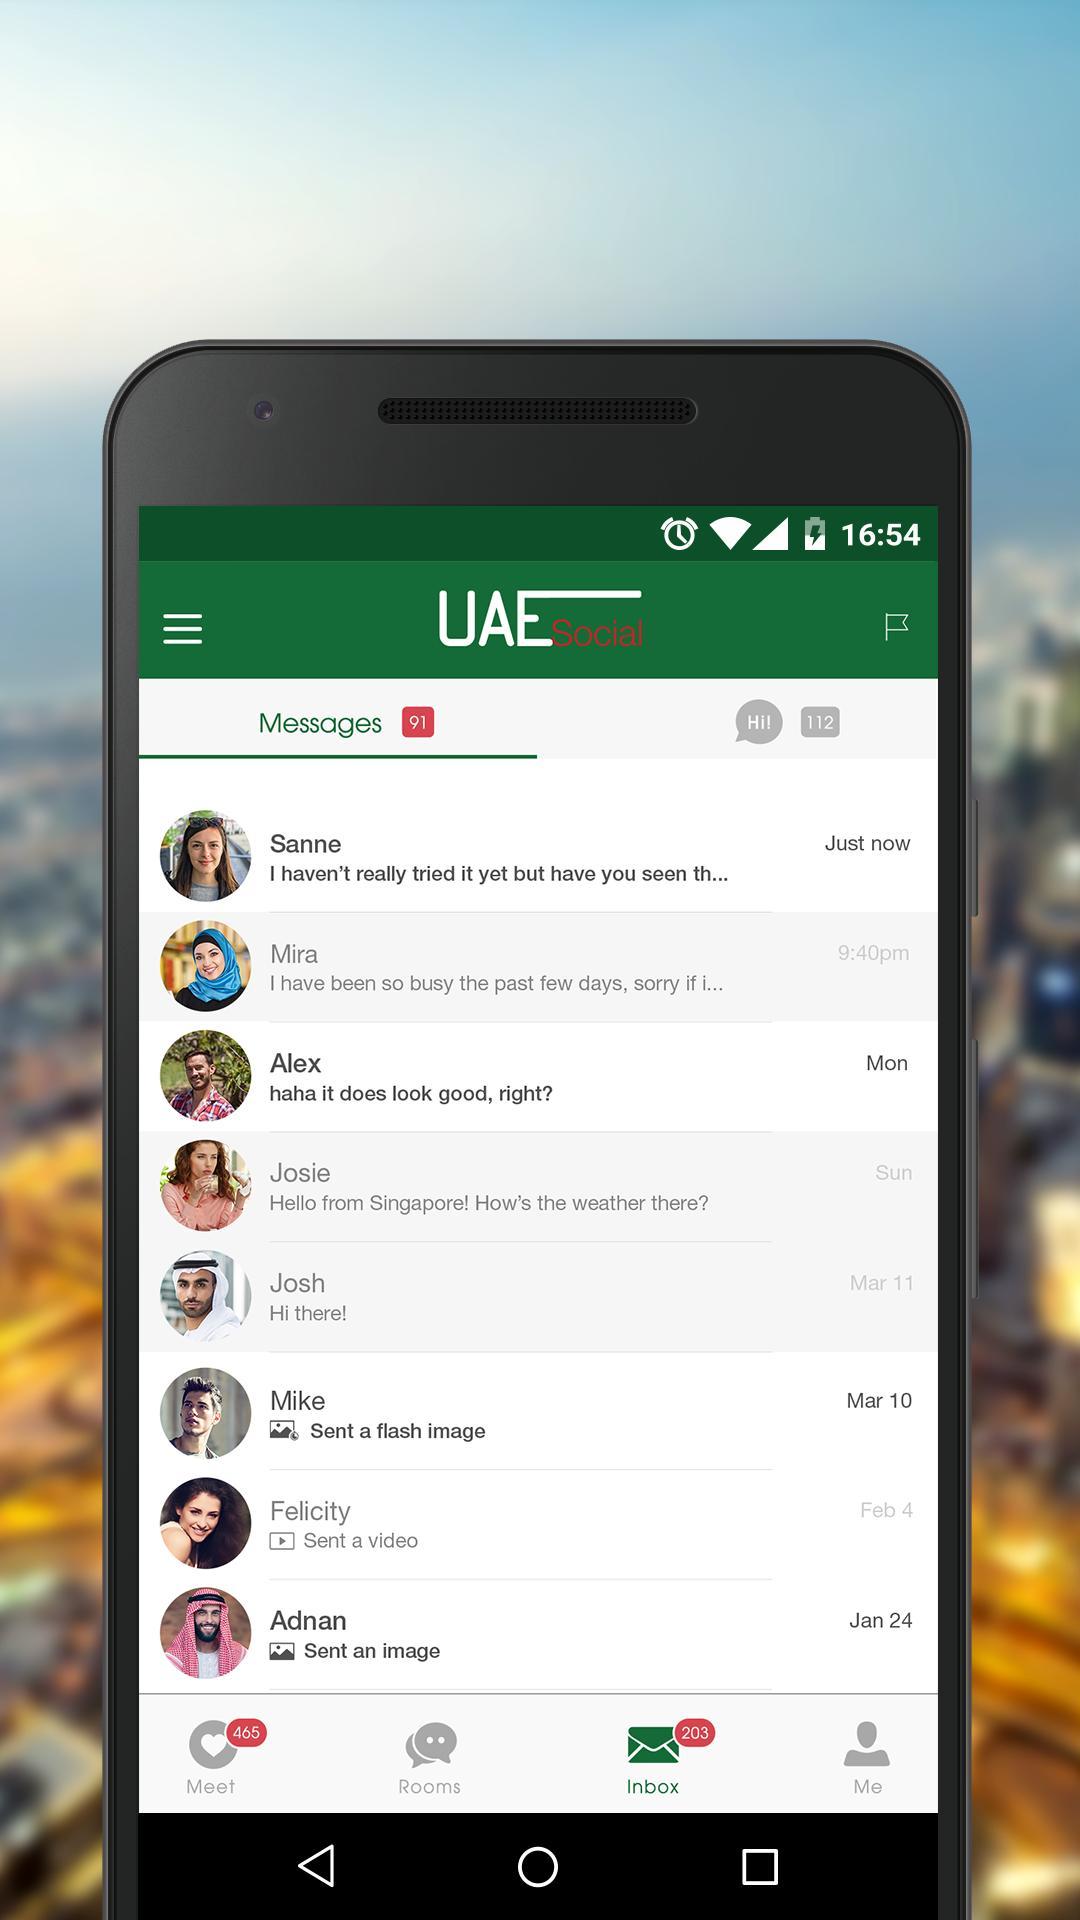 Dating online-UAE